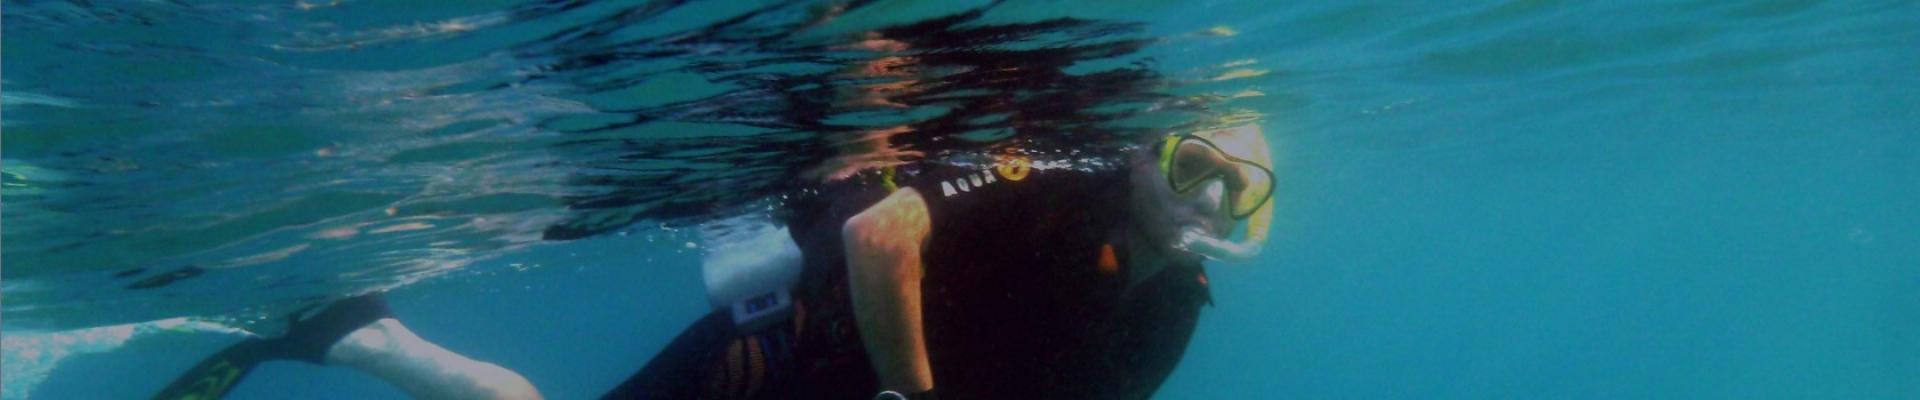 Scuba diving in Udupi, Karnataka